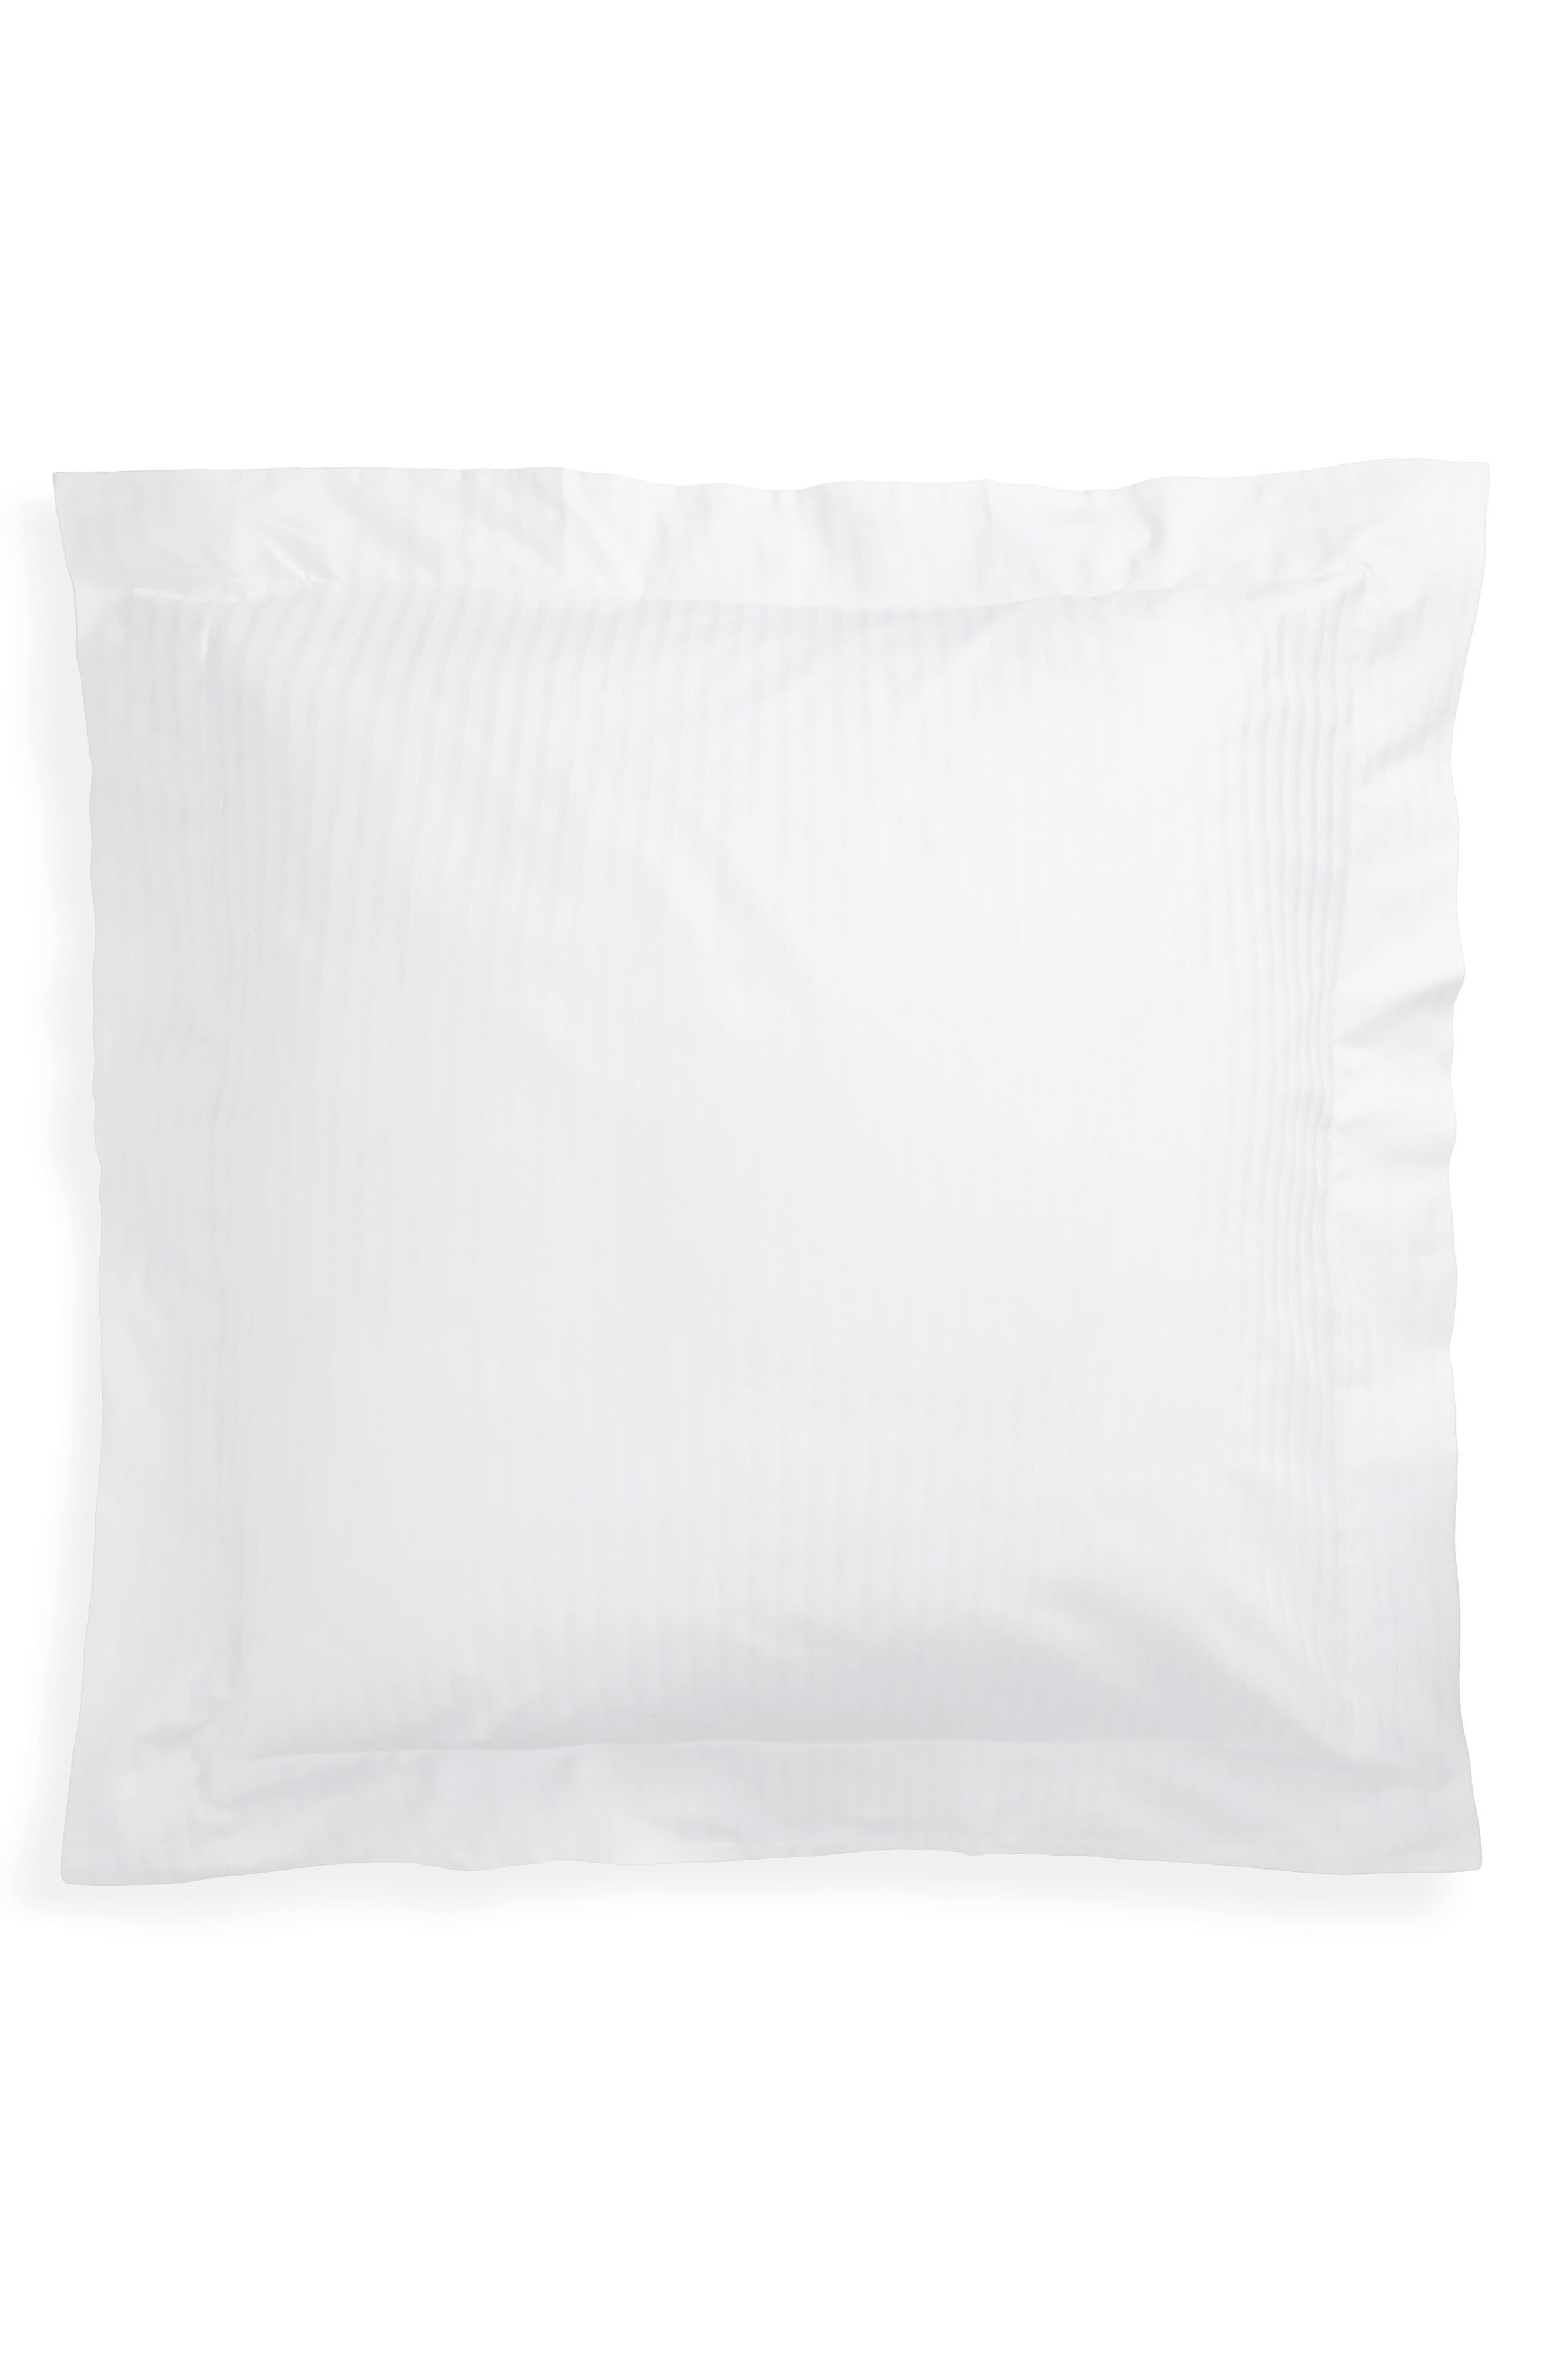 Westin At Home 230 Thread Count Pillow Sham